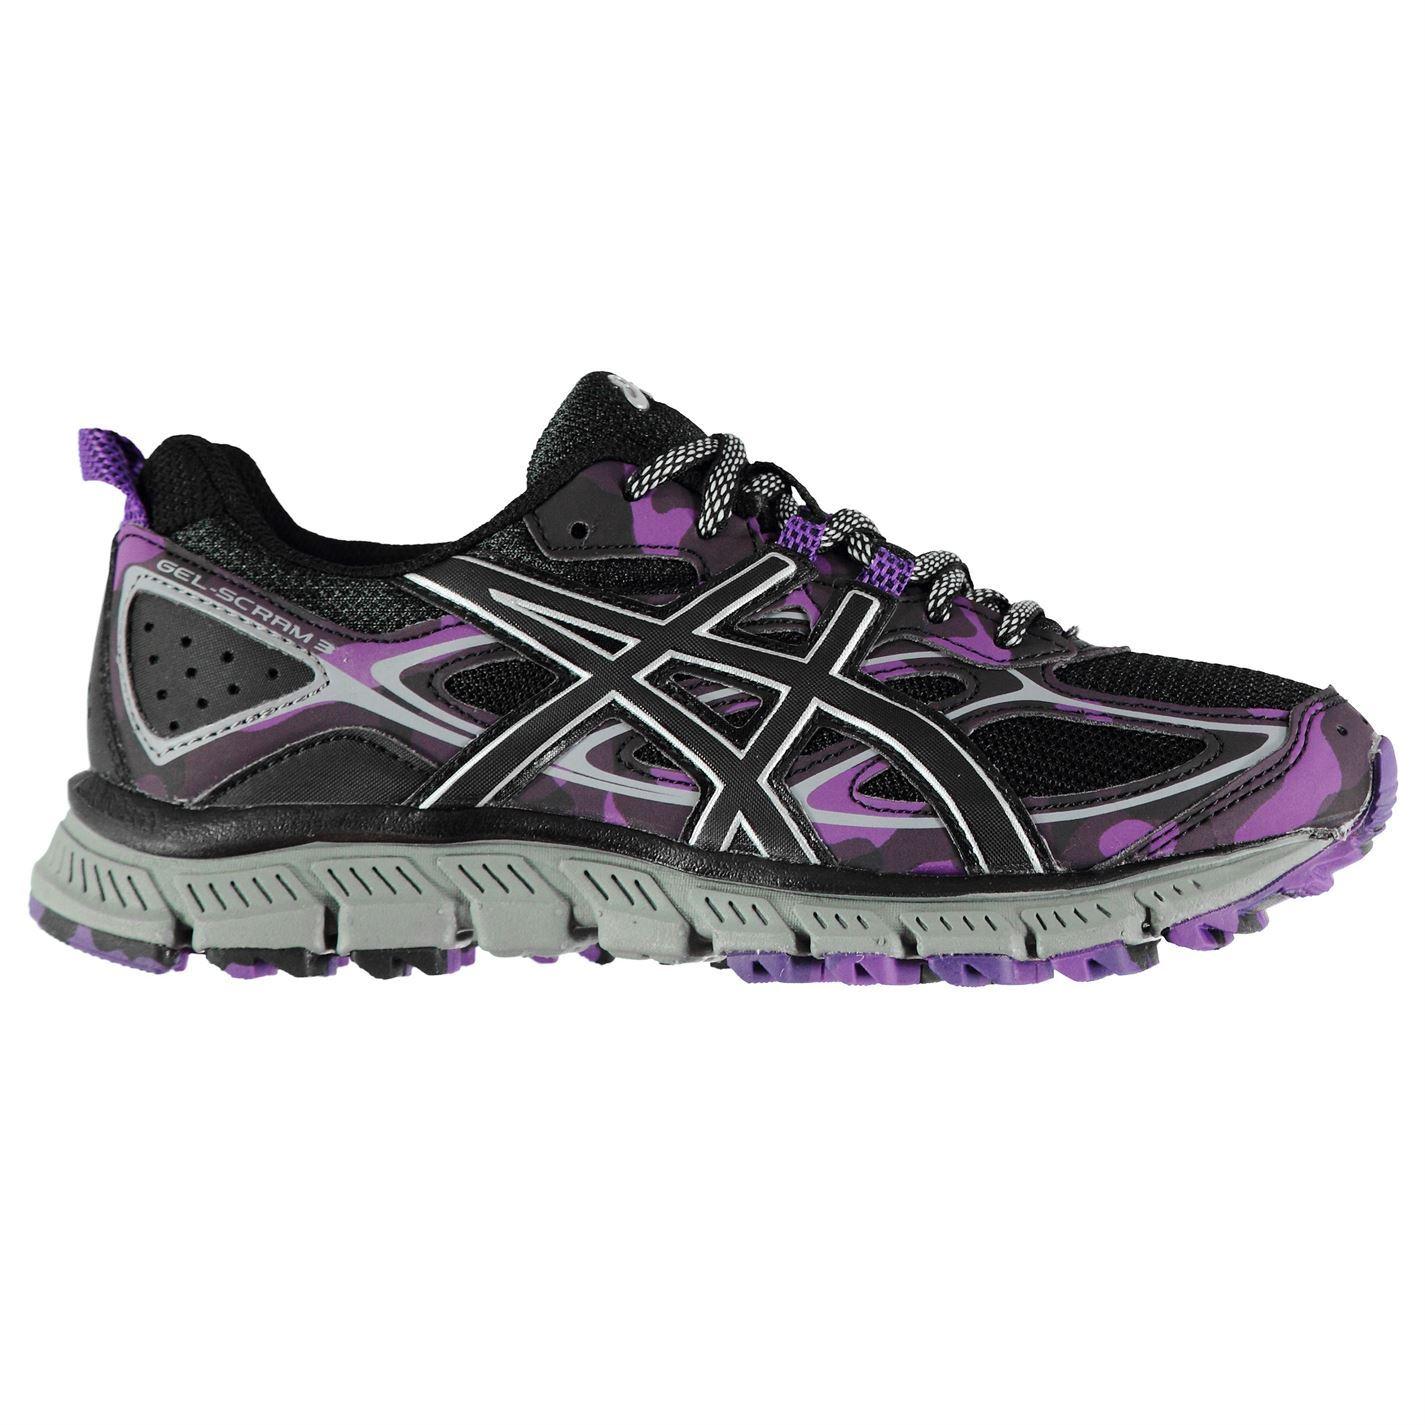 1a1a64c693 ... Asics Gel Scram 3 Scarpe Running donna grigio/rosa eseguire Jogging  scarpe da ginnastica scarpe ...